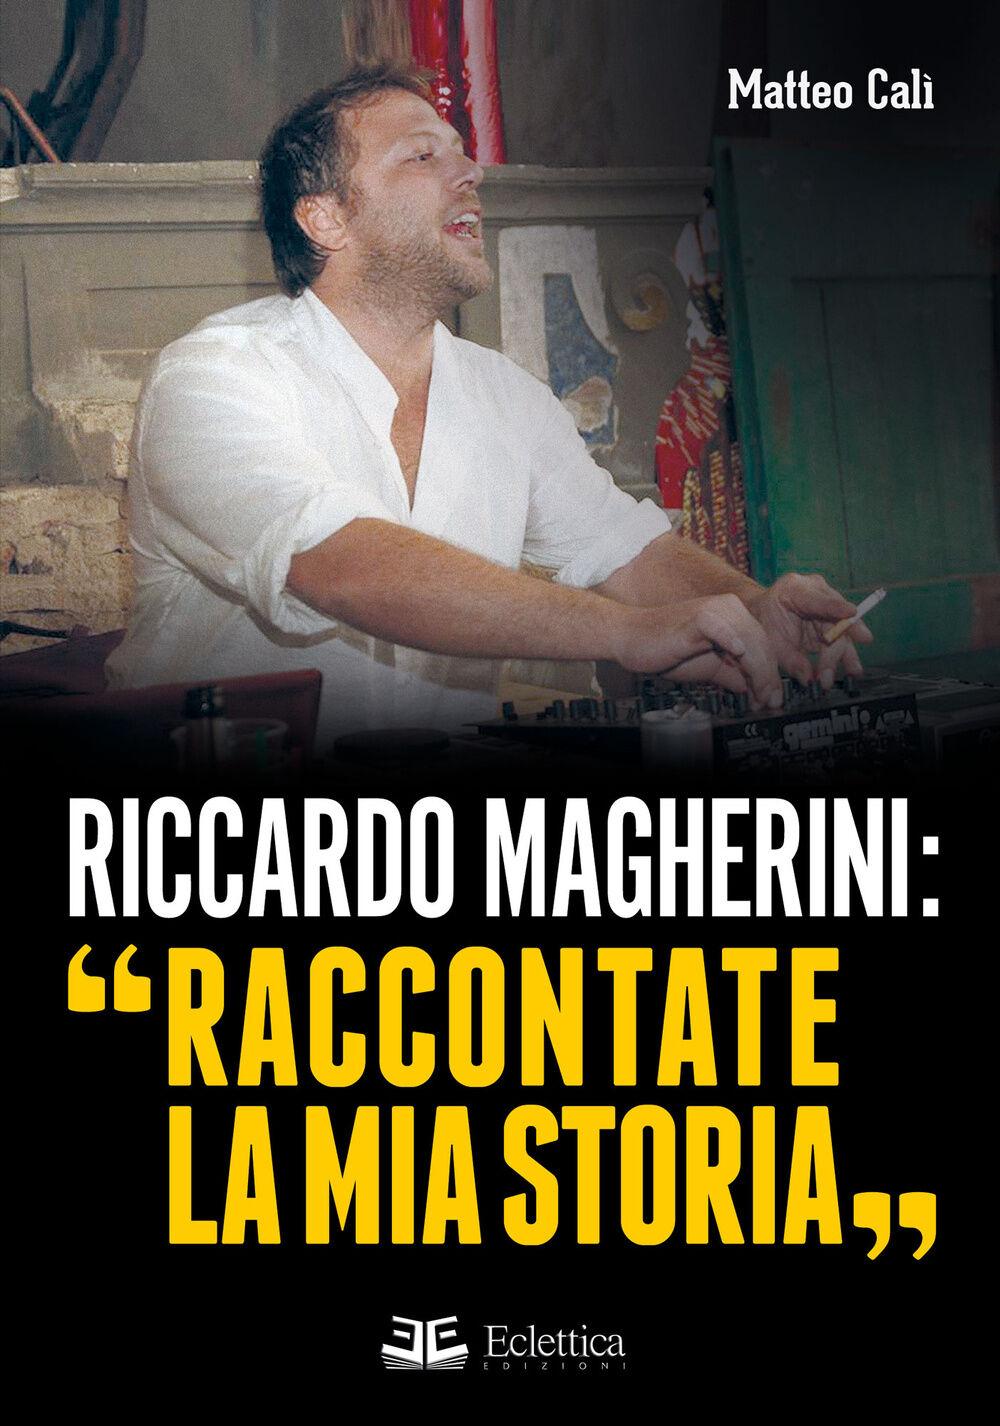 Riccardo Magherini: «Raccontate la mia storia»